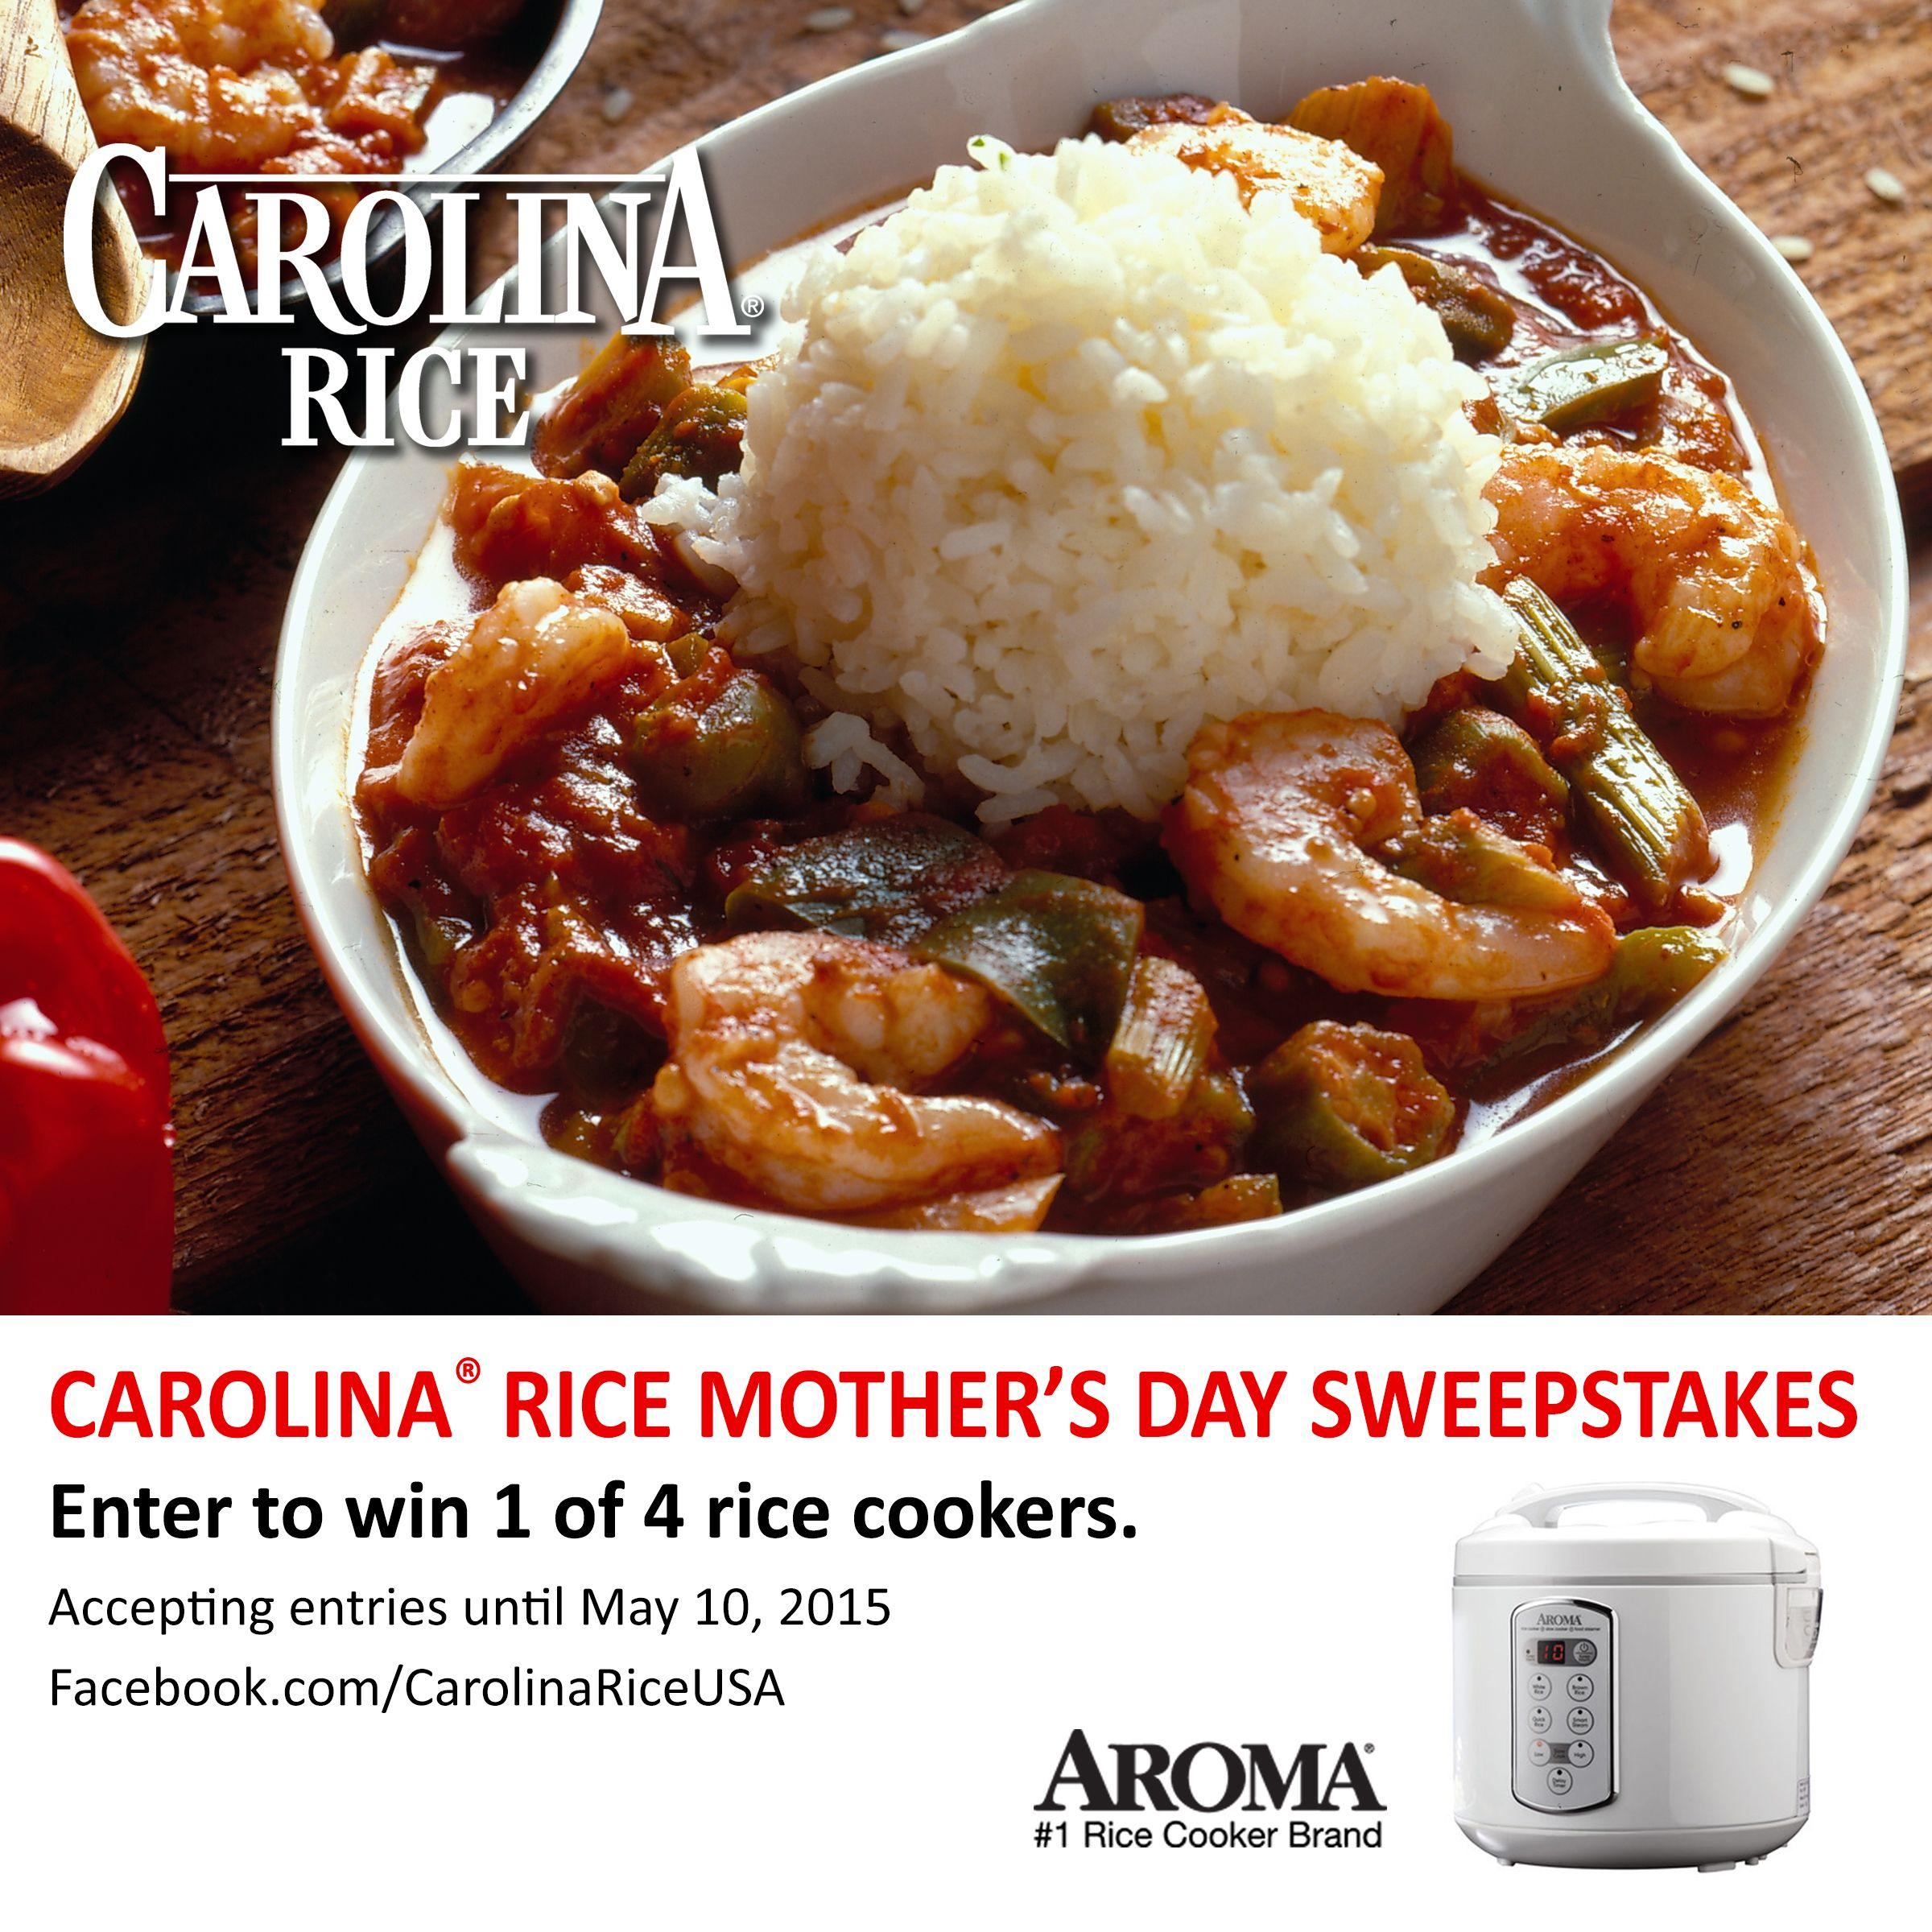 Carolina® Rice Mother's Day Sweepstakes Aroma rice